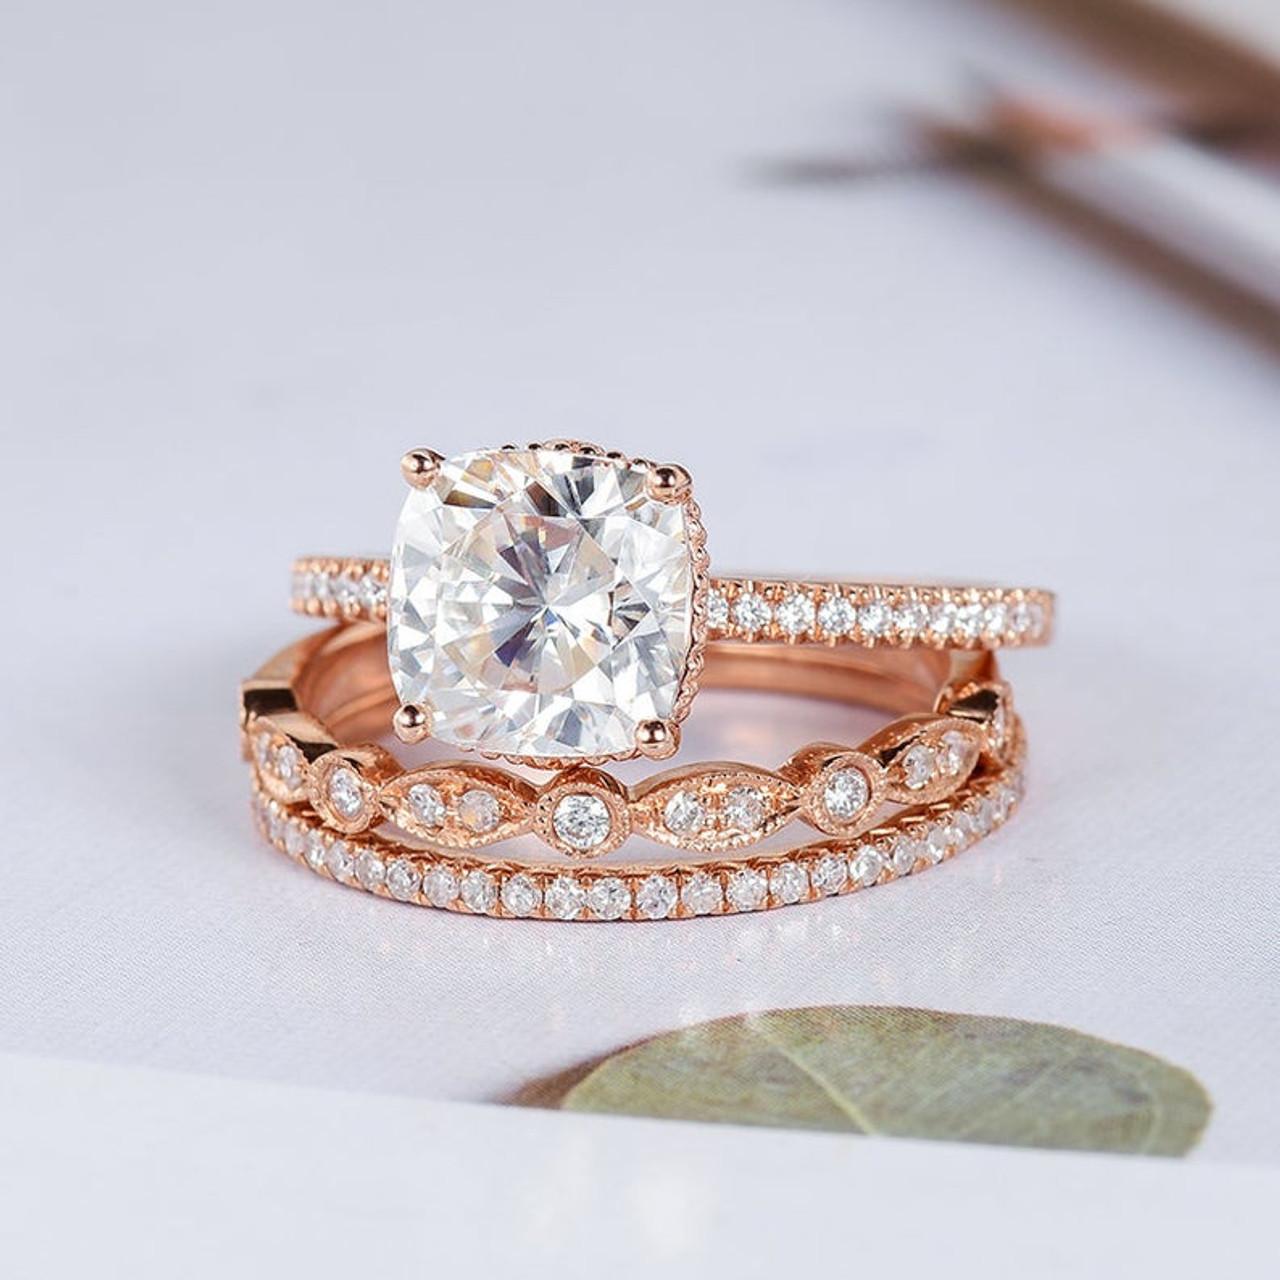 Cushion Cut Moissanite Engagement Rose Gold Bridal Ring Sets